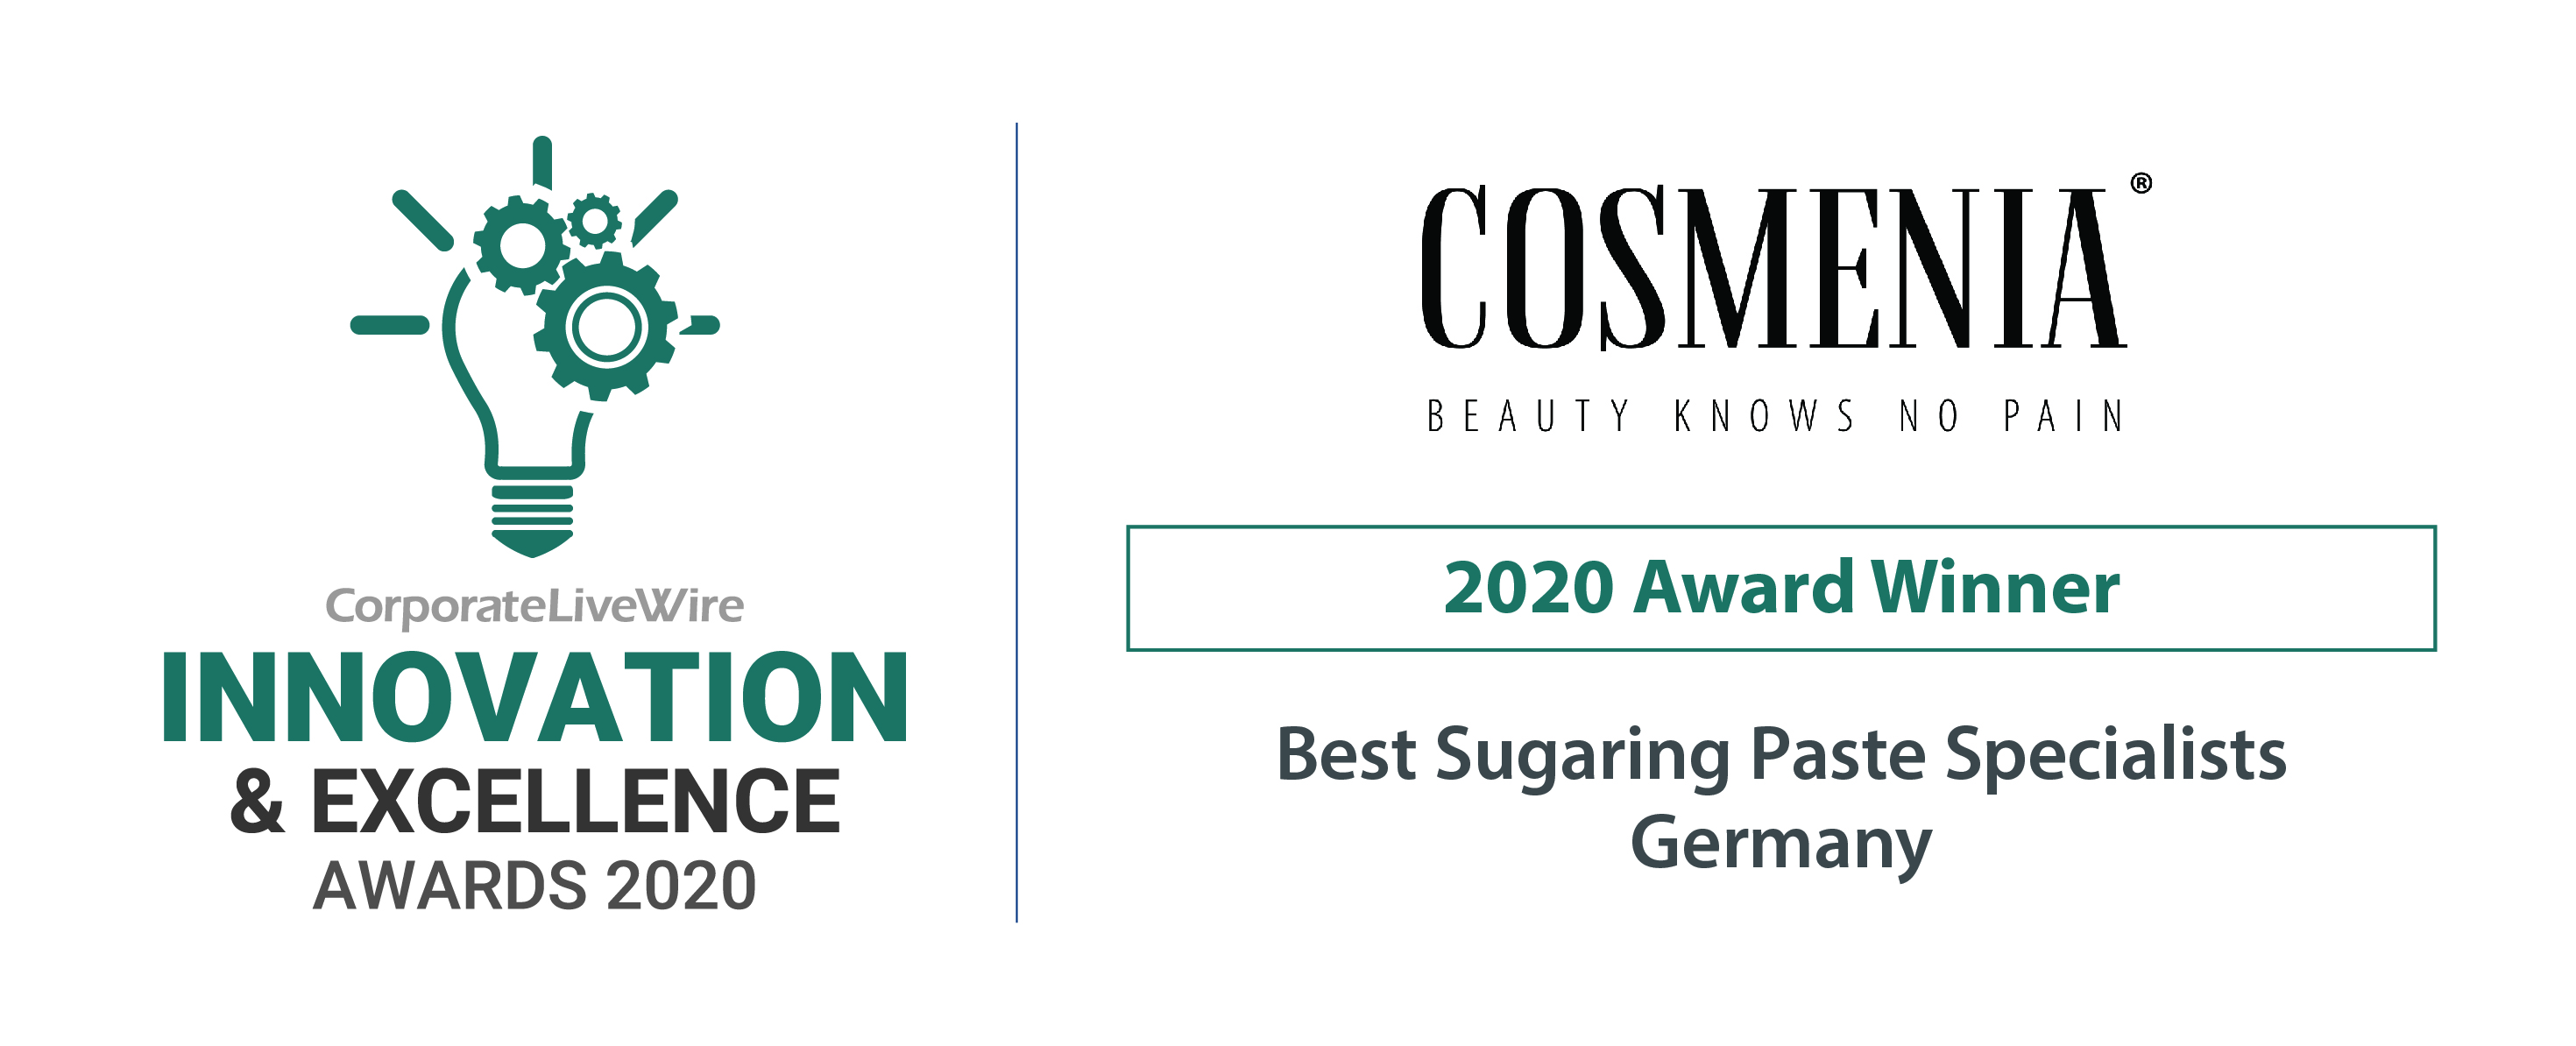 beste zuckerpaste gewinner cosmenia sugaring 2020